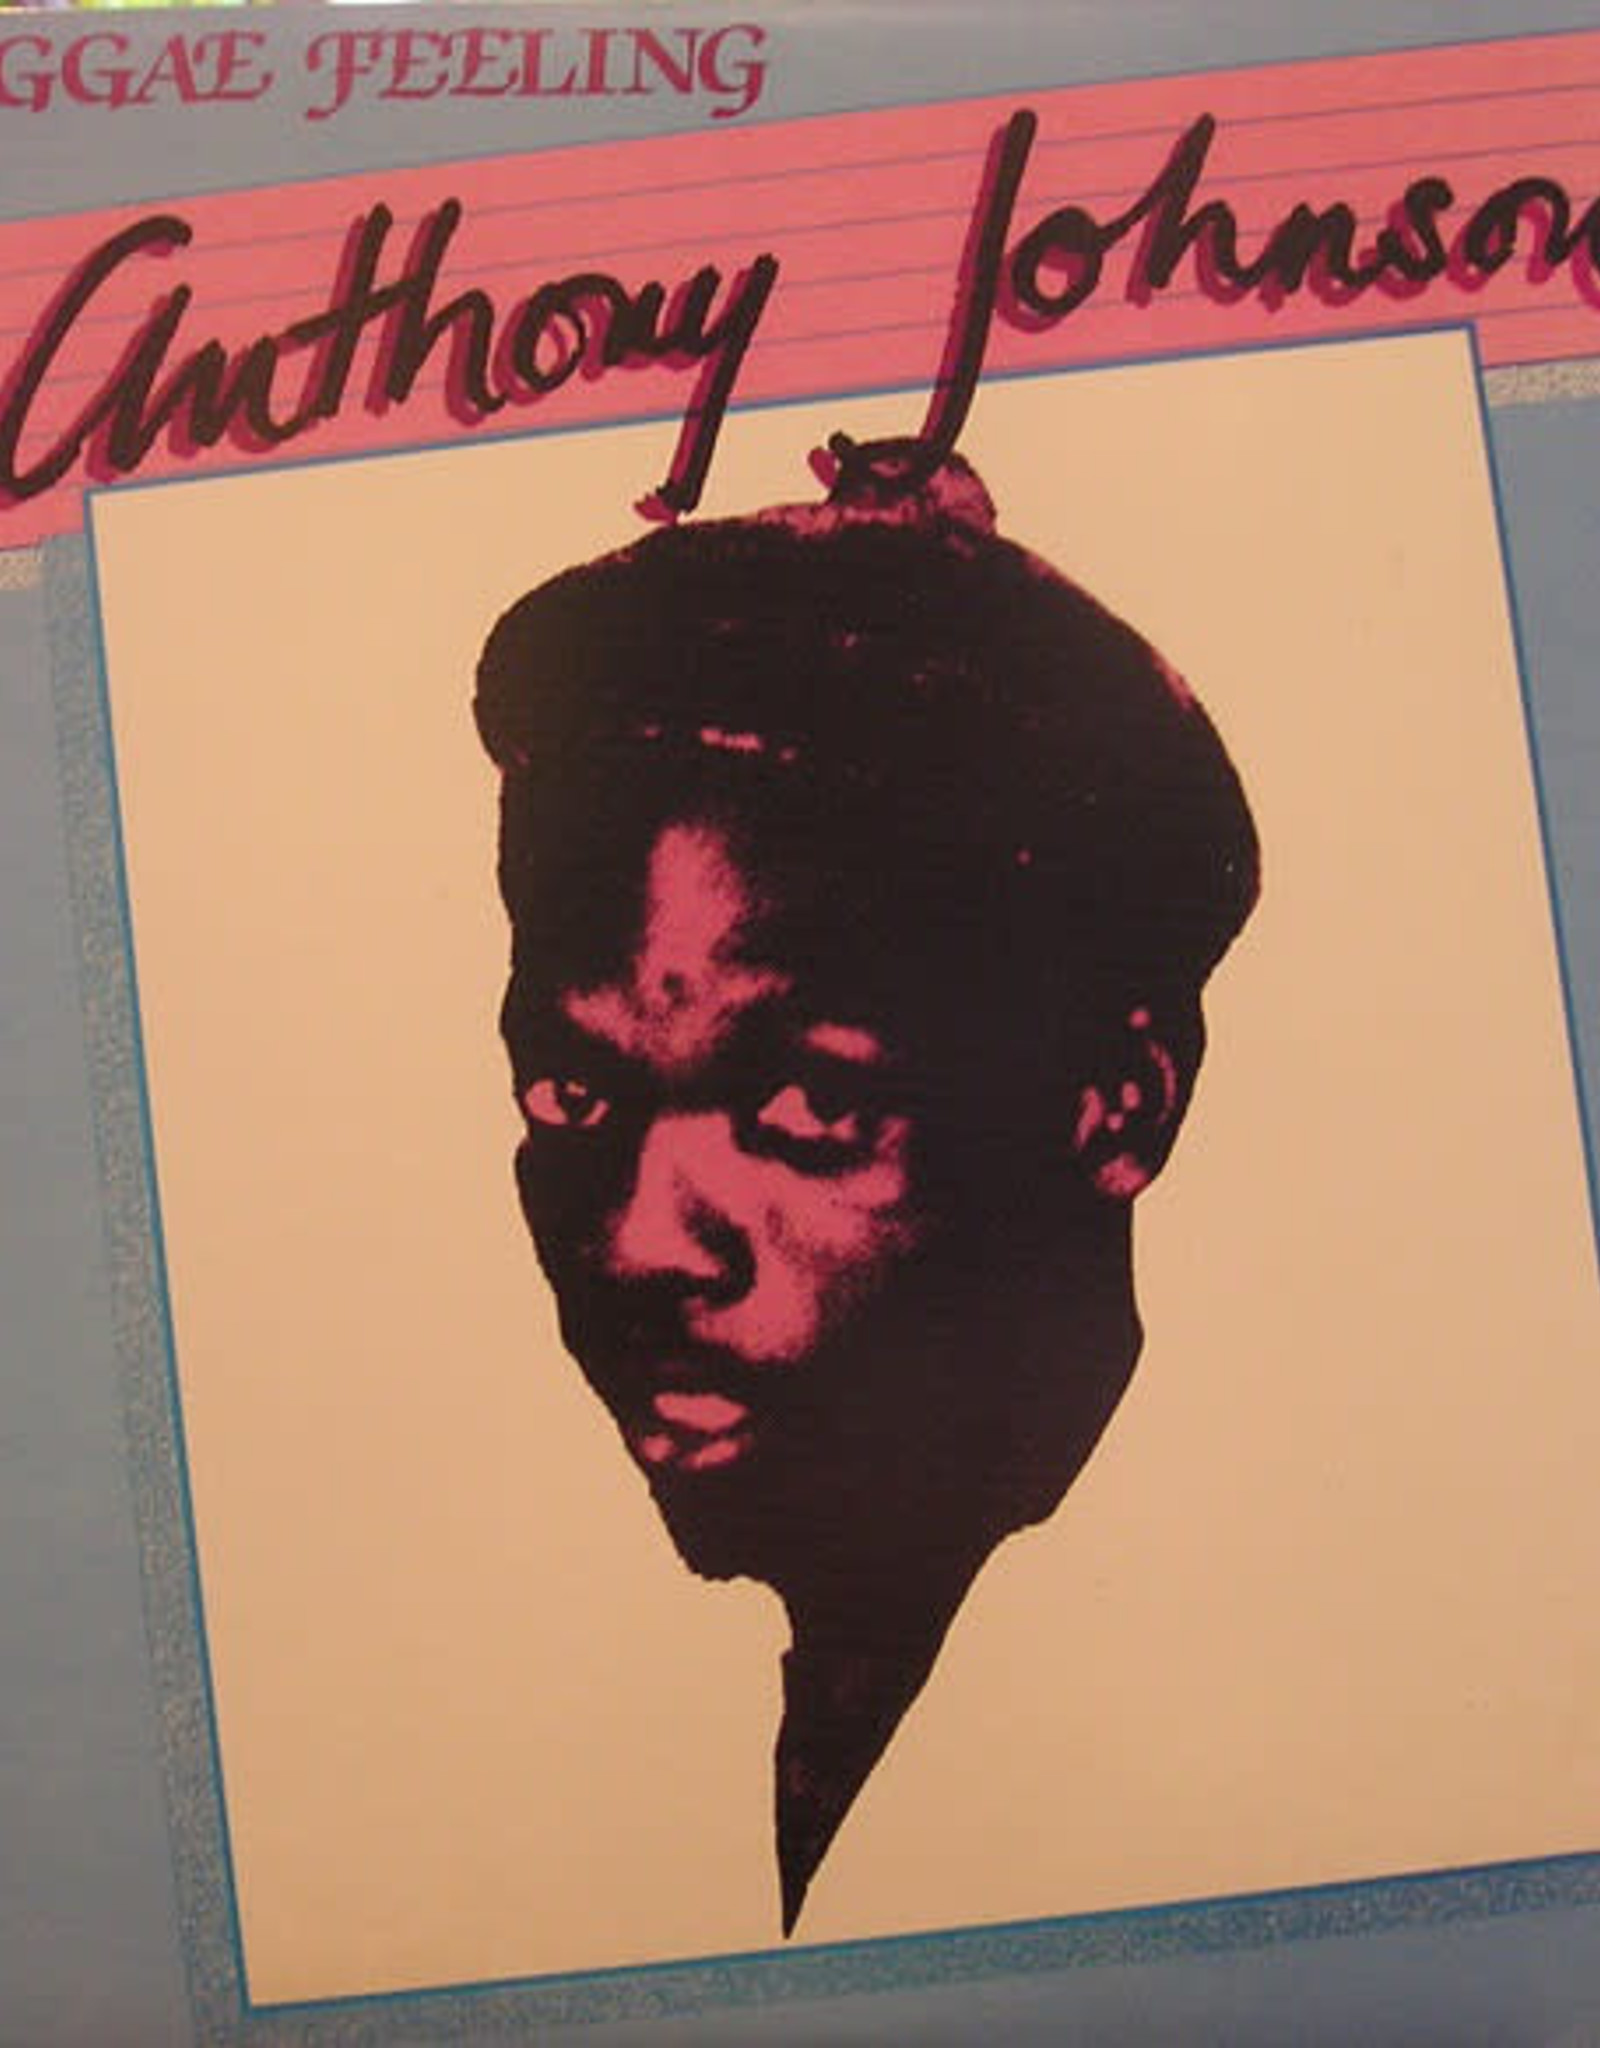 Anthony Johnson - Reggae Feeling